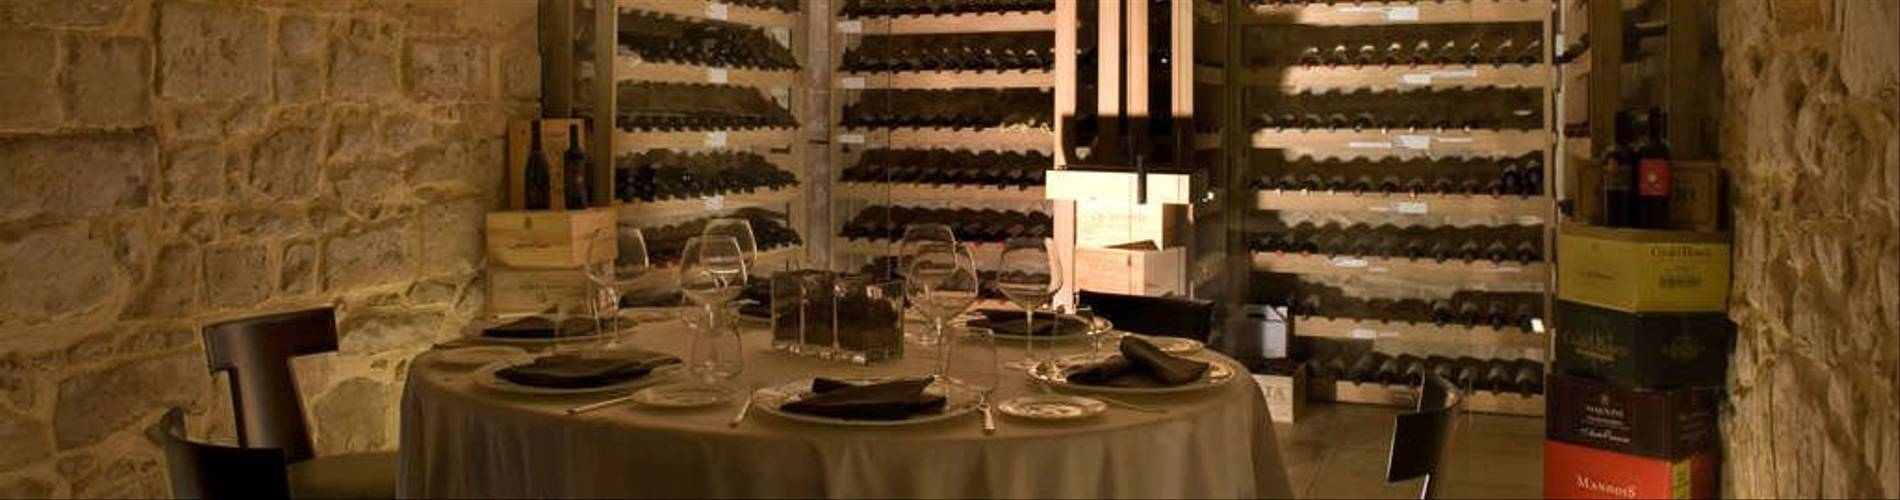 Risorgimento Resort 2.jpg